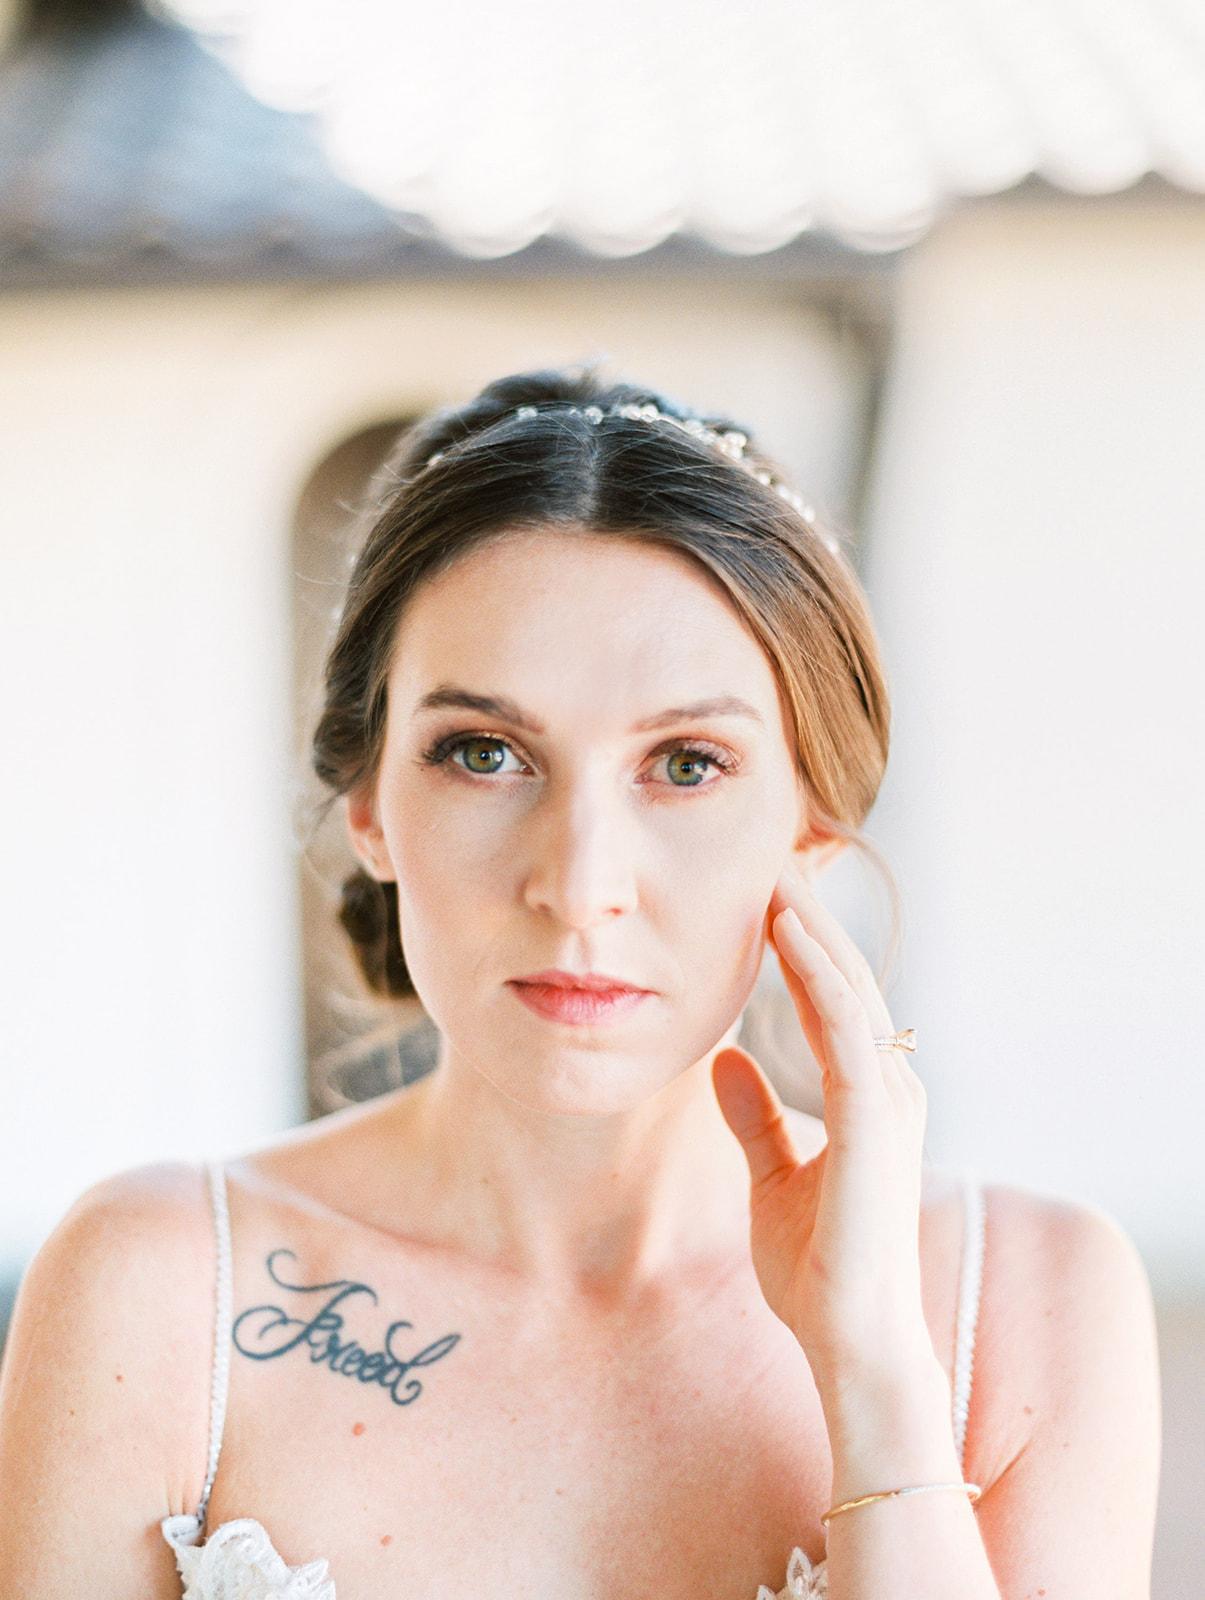 Simple bridal makeup: Elopement vineyard wedding at Umbra Winery by Alexa Kay Events. See more wedding ideas at alexakayevents.com!